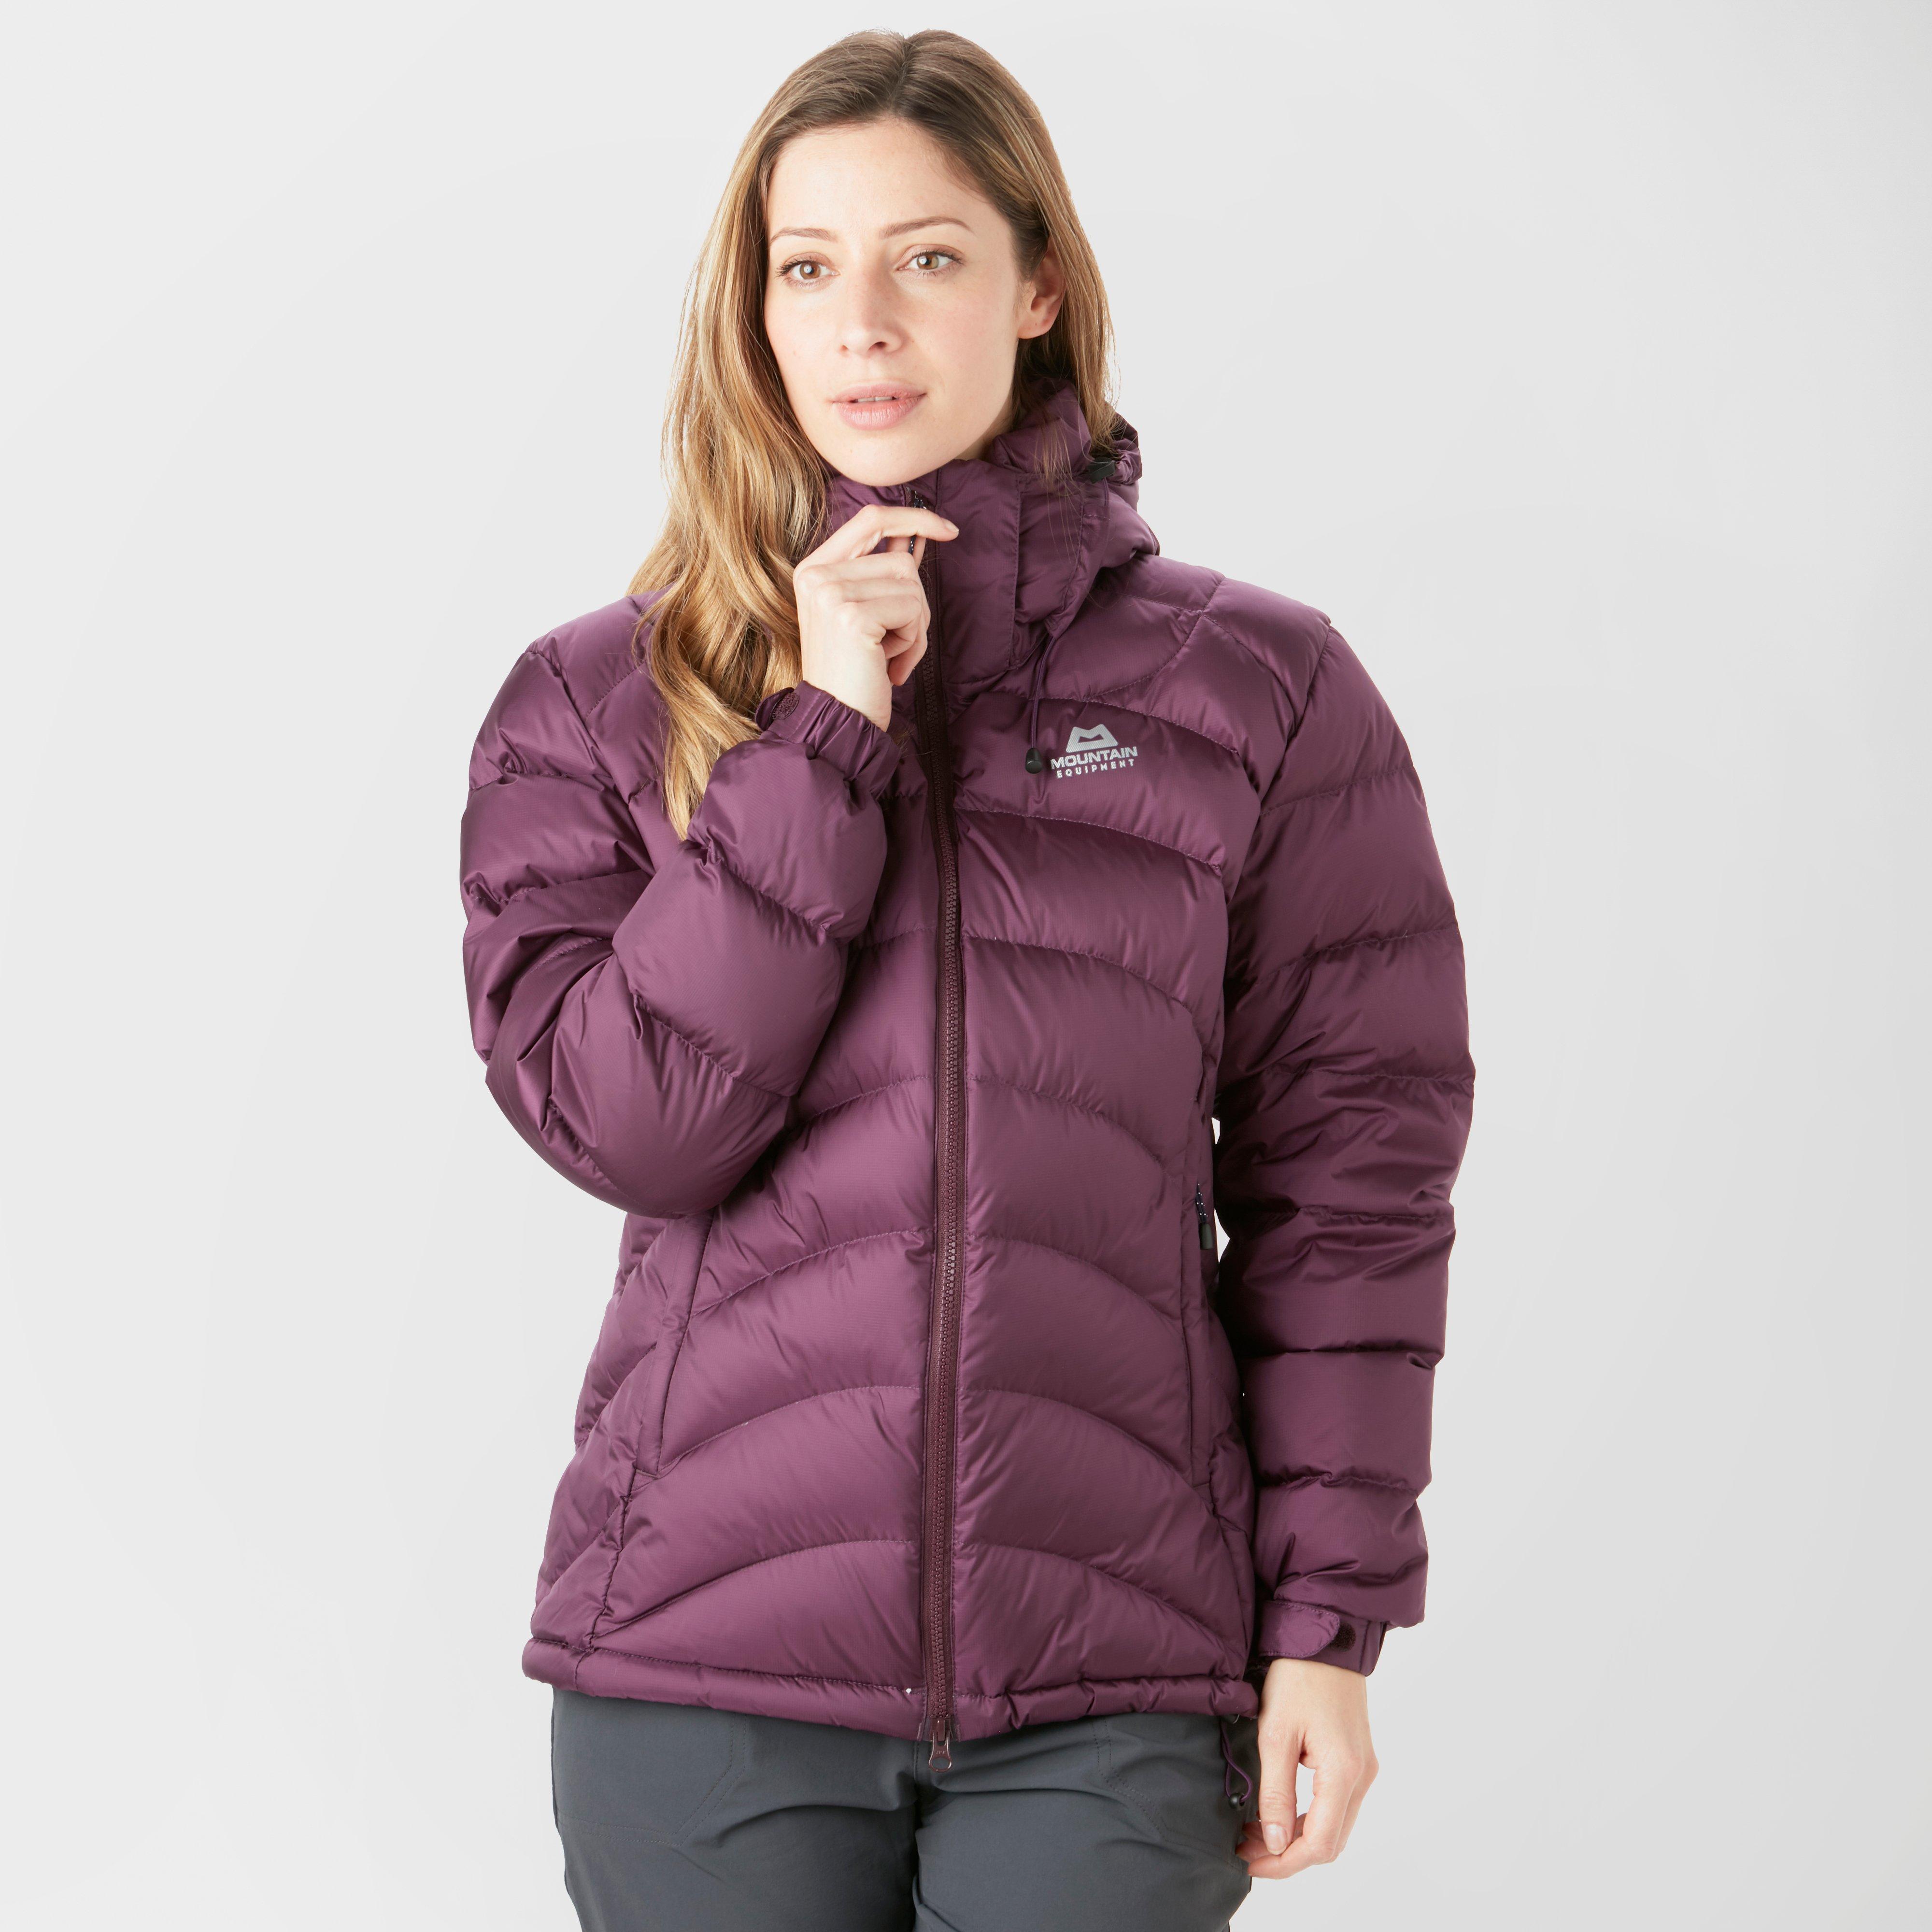 Mountain Equipment Women's Lightline Down Jacket, Plum